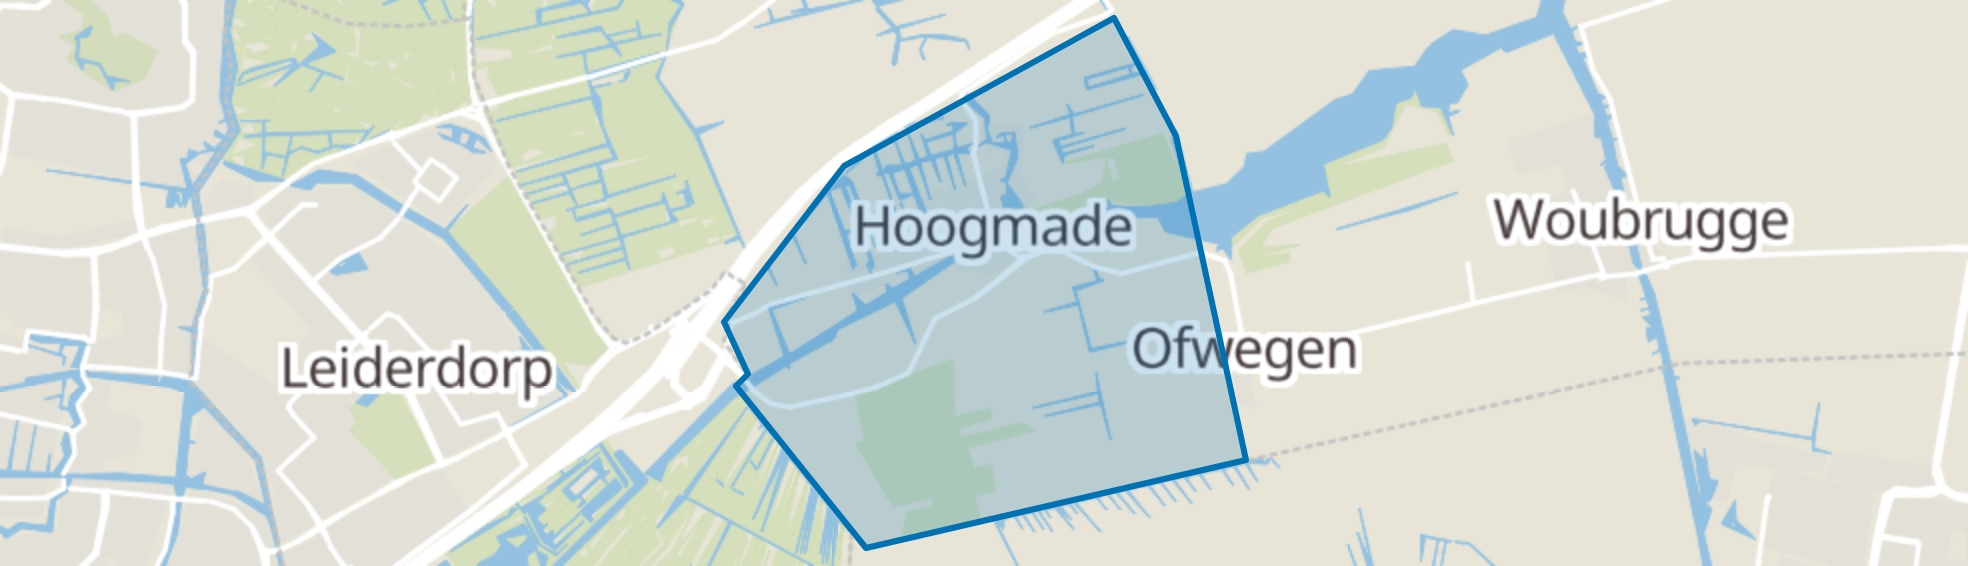 Hoogmade map